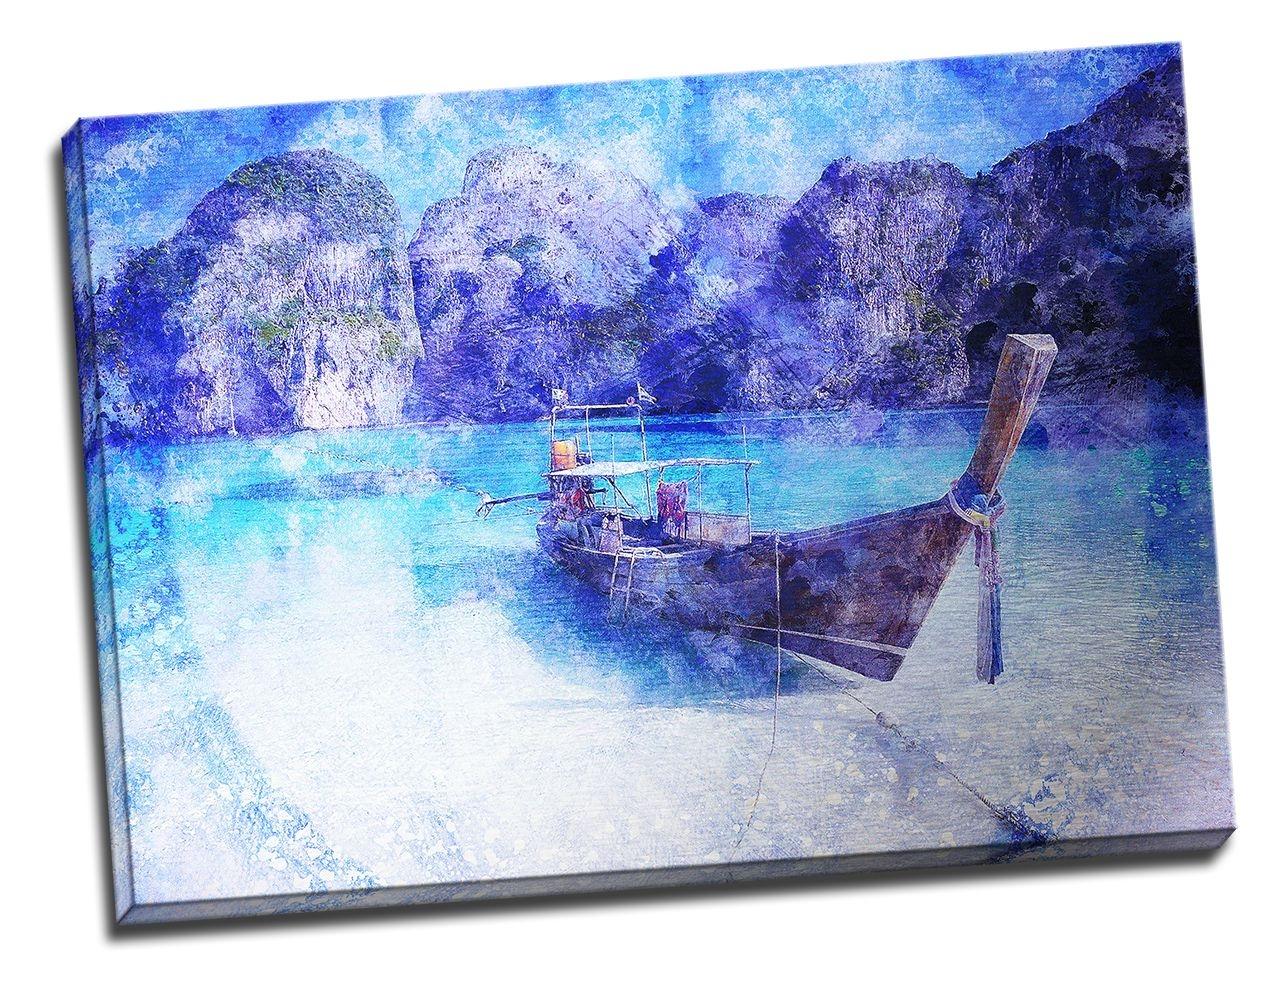 Tablou din aluminiu striat Blue Boat Wait for Me